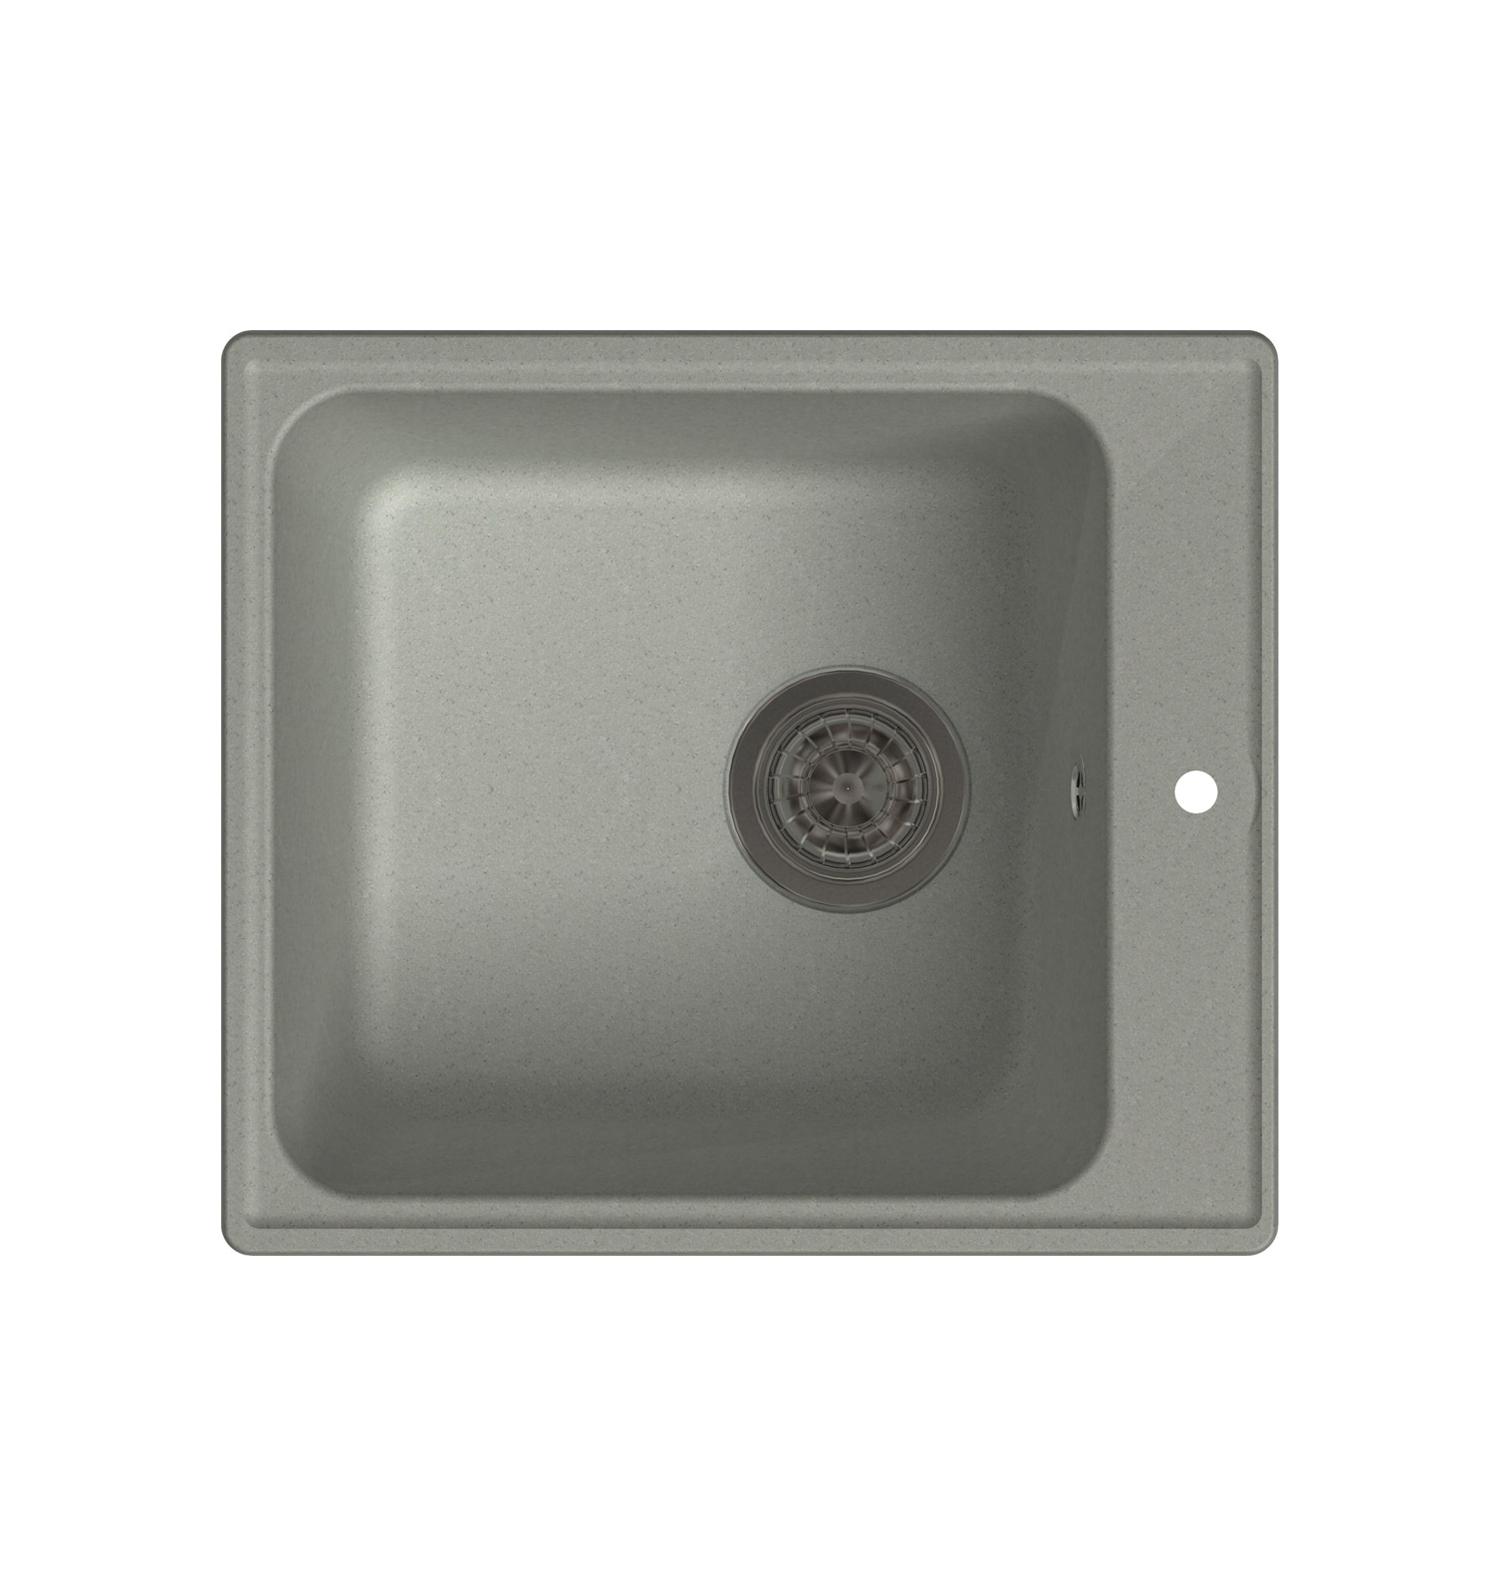 LEX Balaton 420 Space Gray